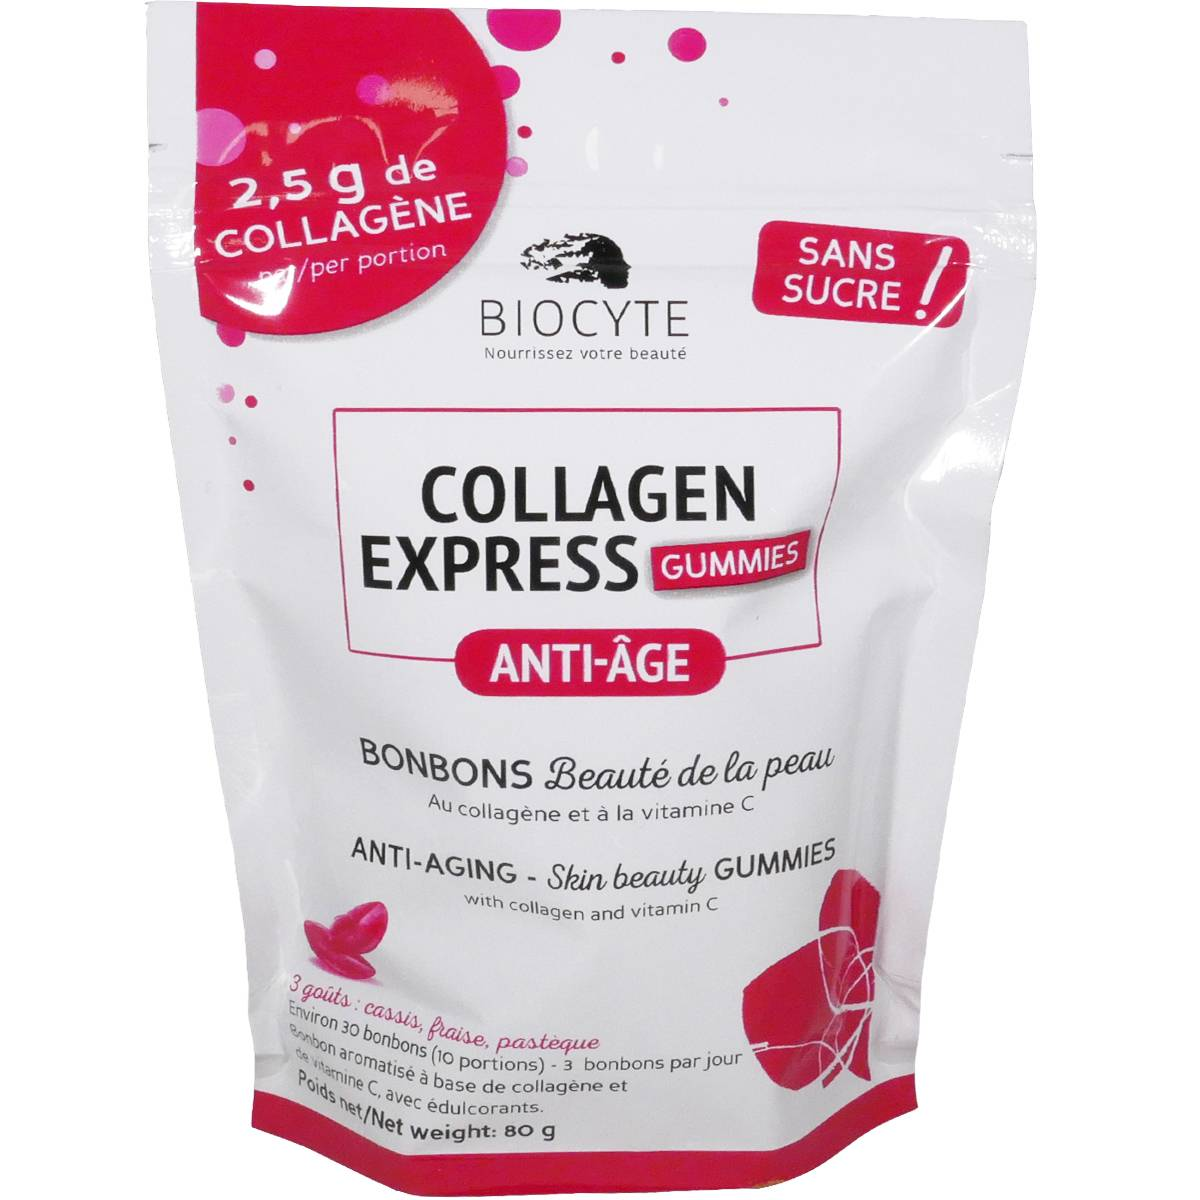 BIOCYTE Collagen express gummies anti-age bonbons 80 g